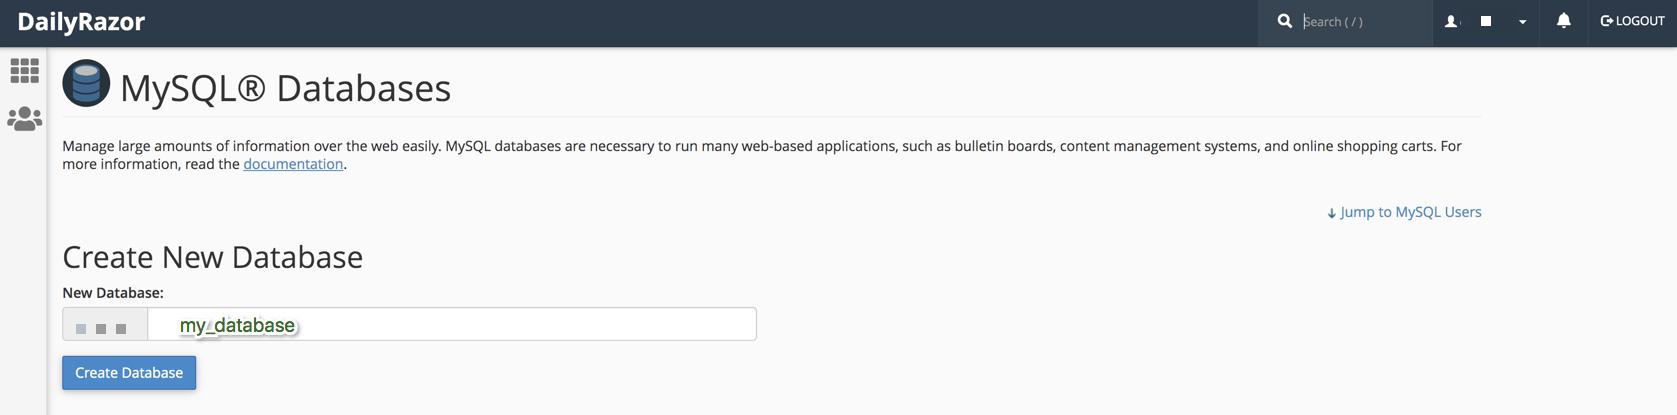 Creating a MySQL Database via CPanel